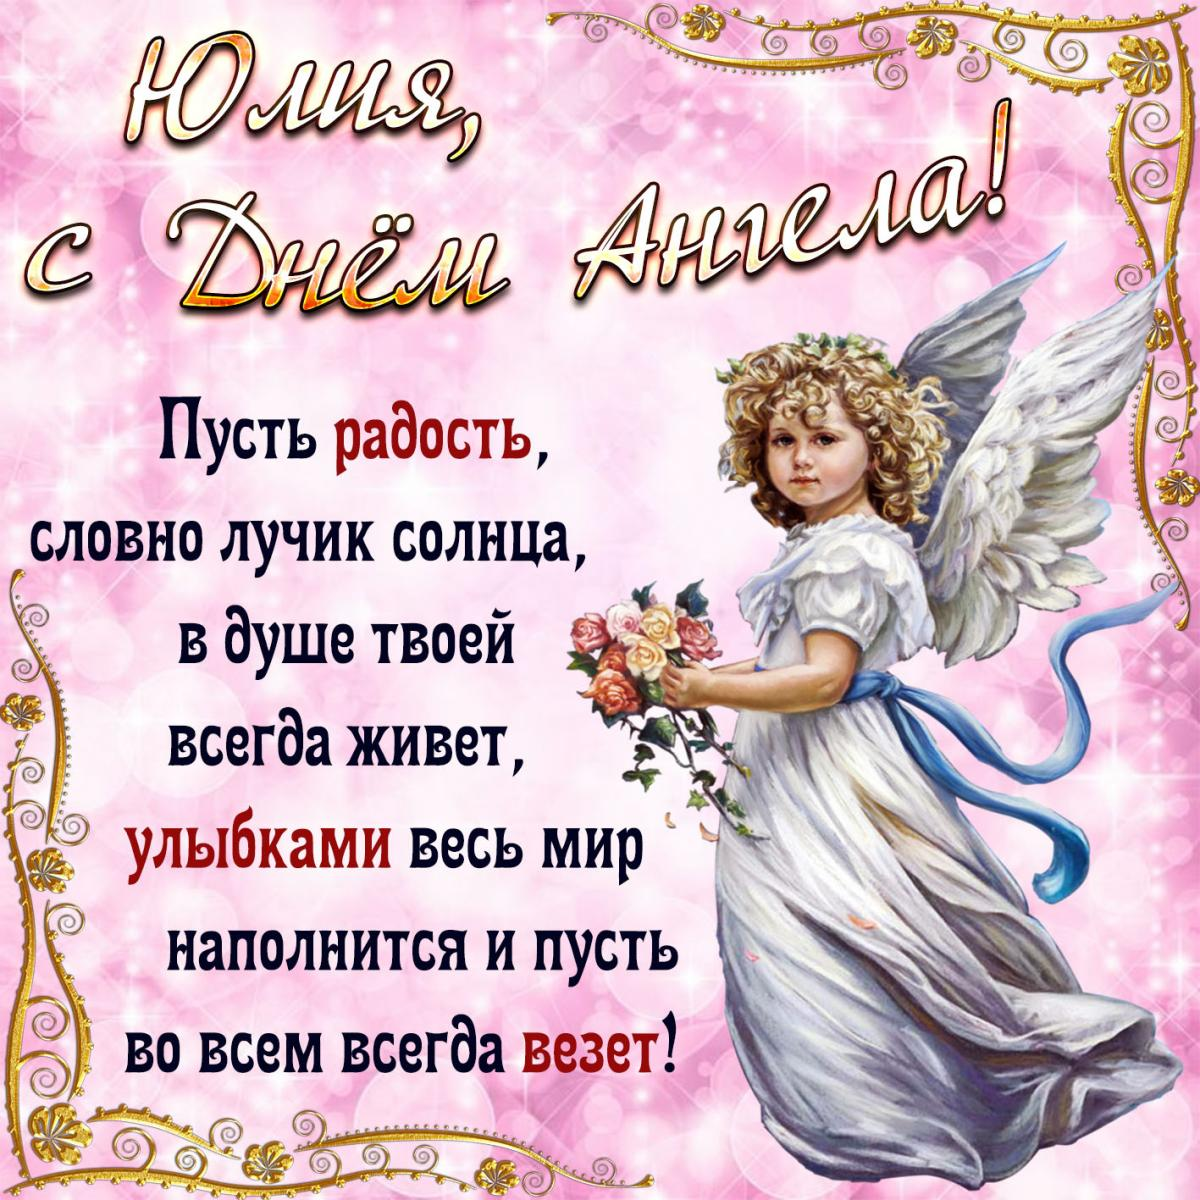 С Днем ангела Юлии картинки / фото bonnycards.ru